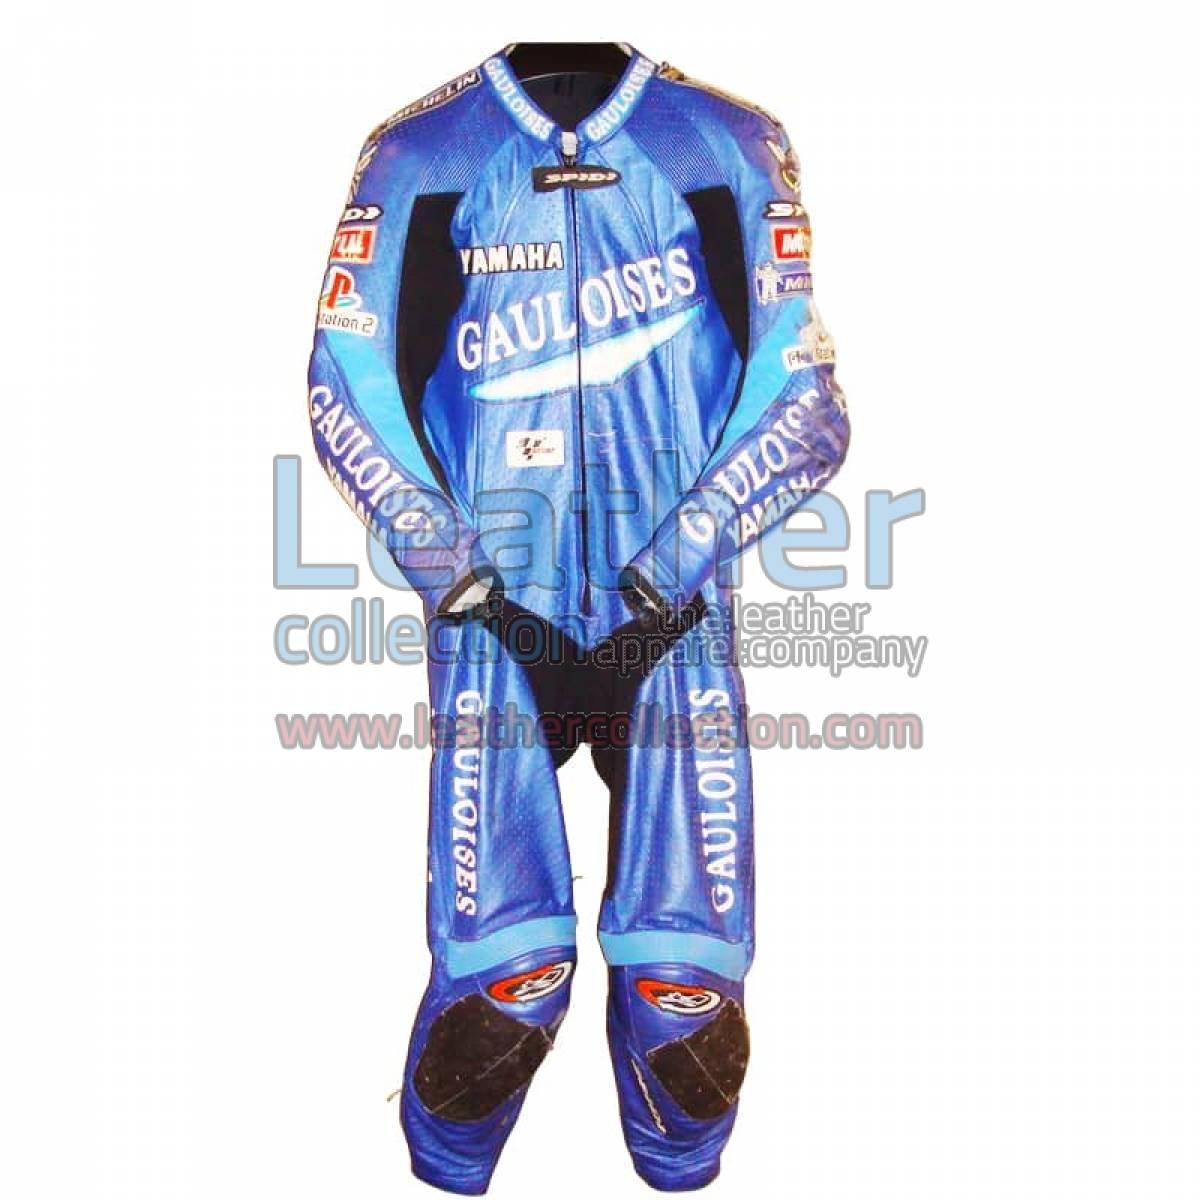 Olivier Jacque Yamaha GP 2003 Racing Suit